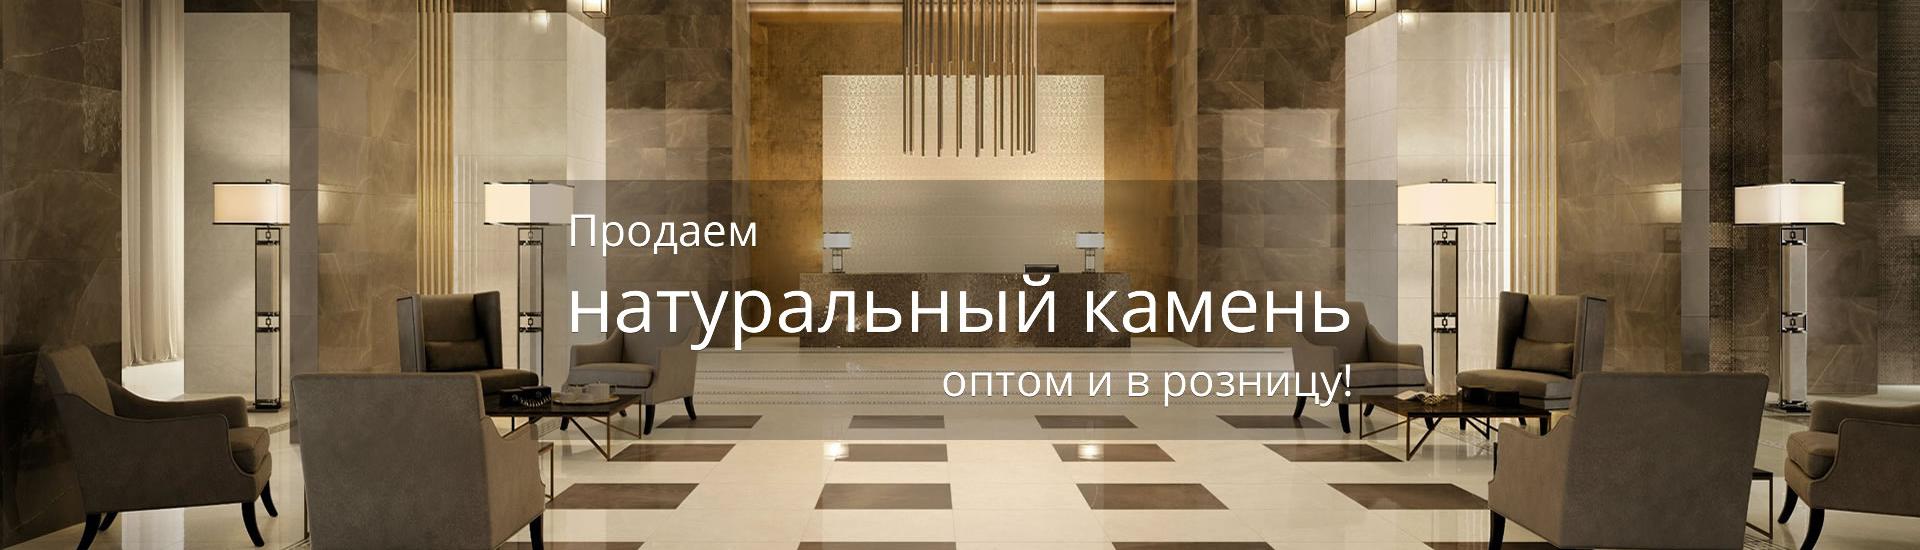 banner_1_1